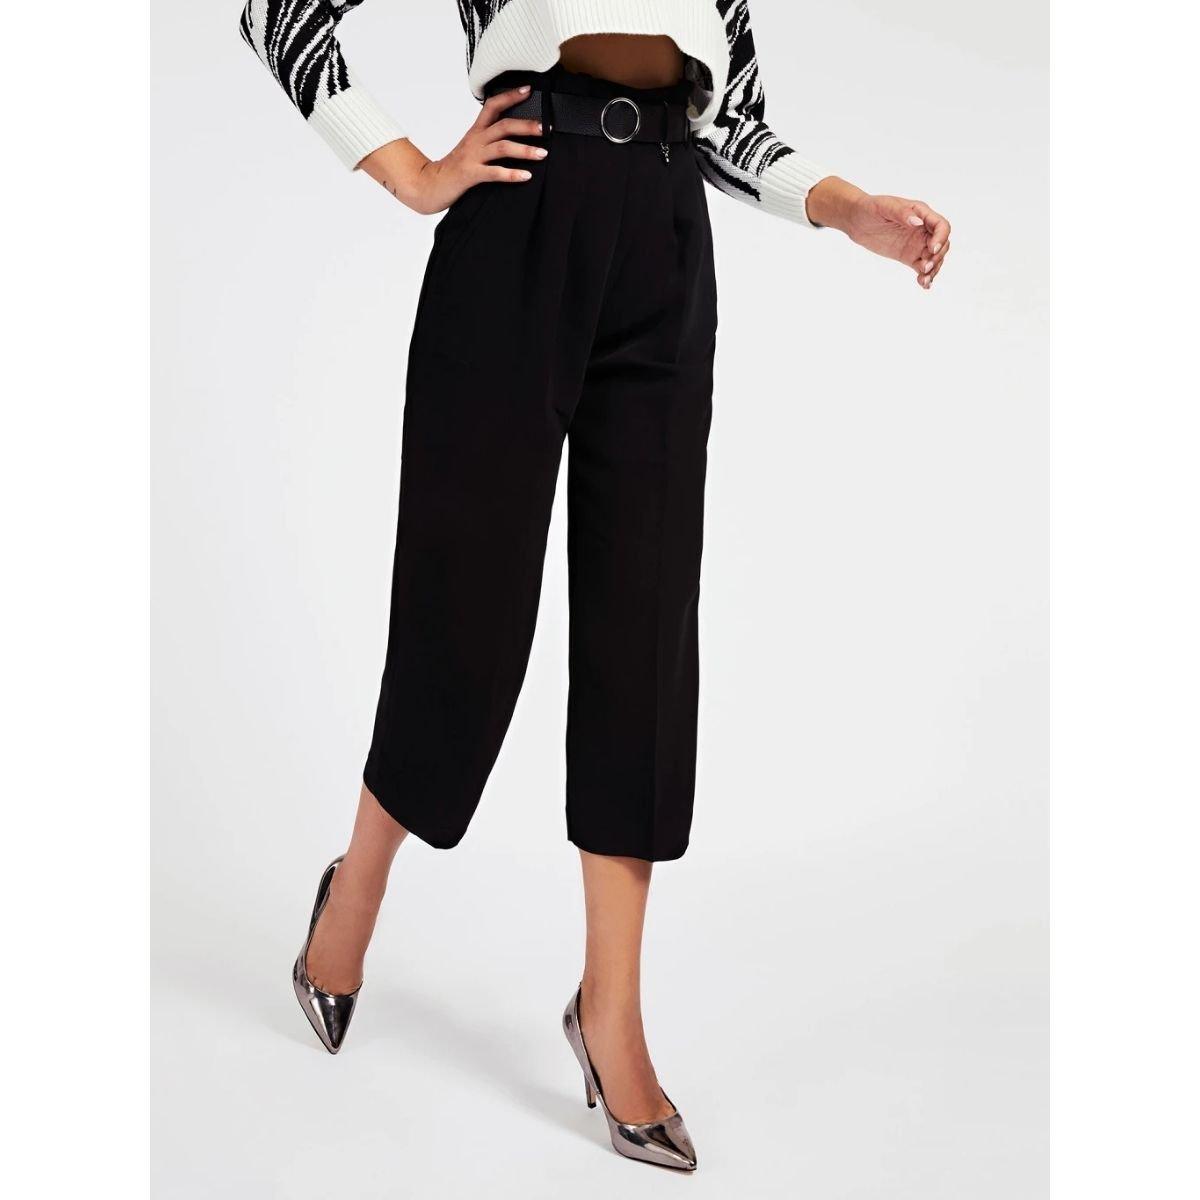 Pantalone Guess A Vita Alta...